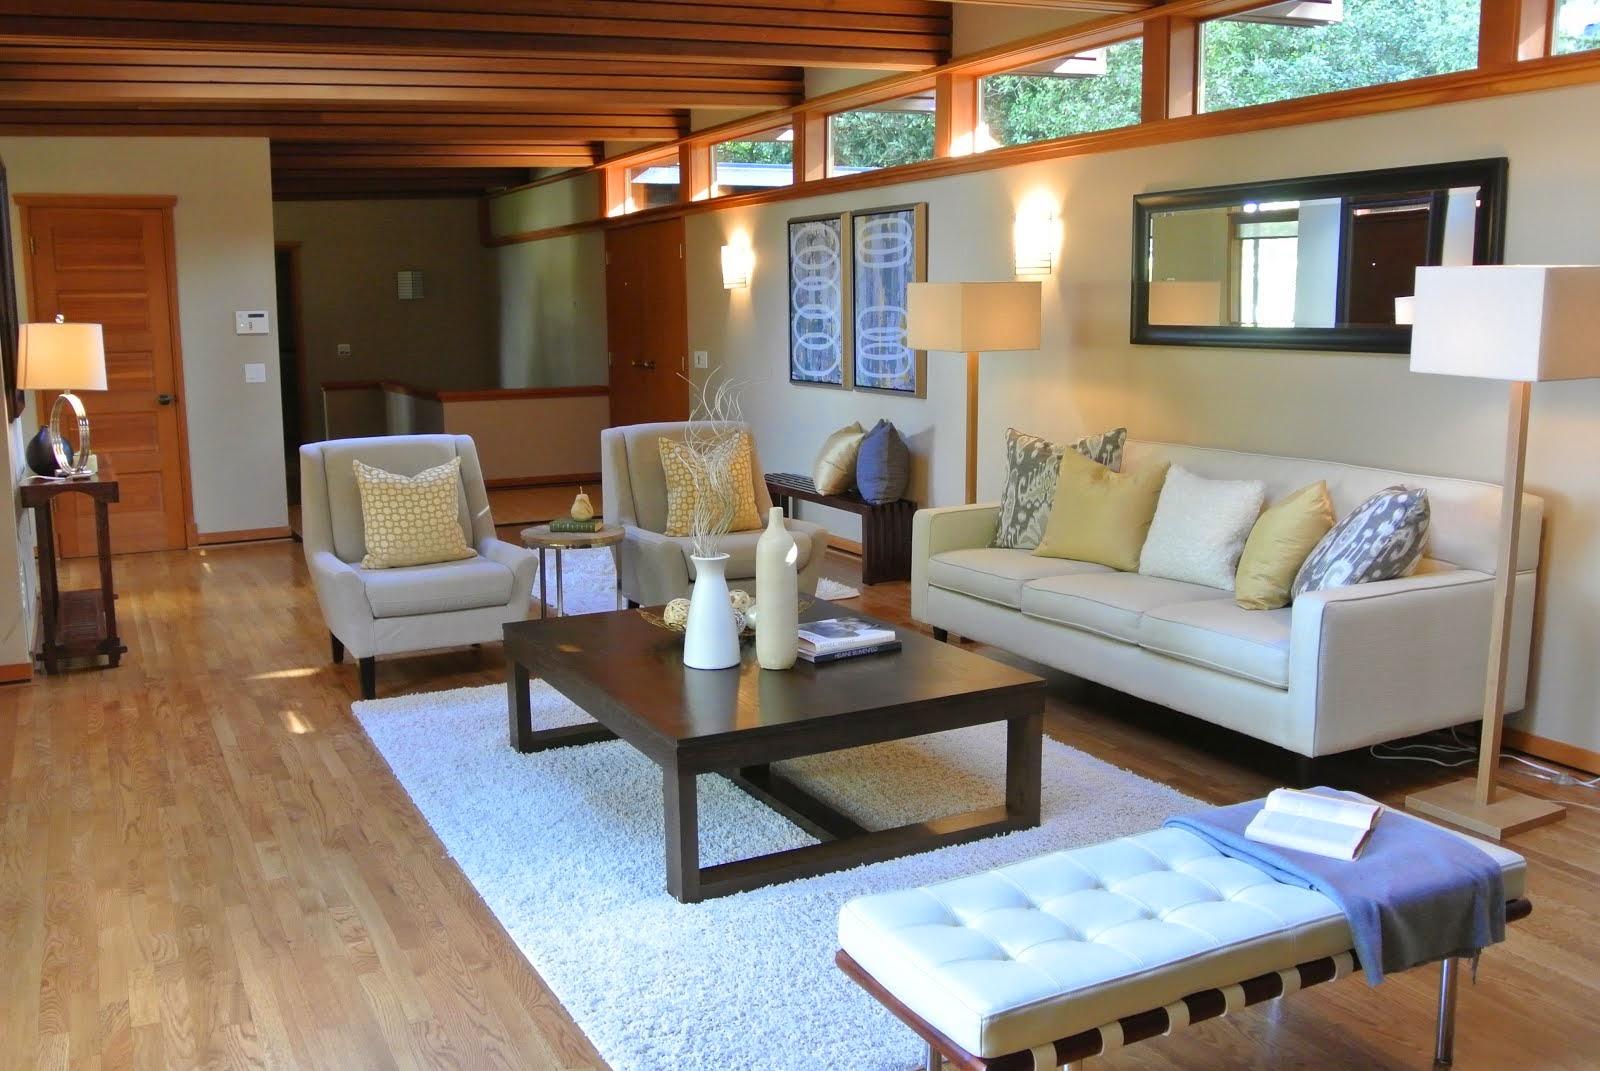 Open House Vibe